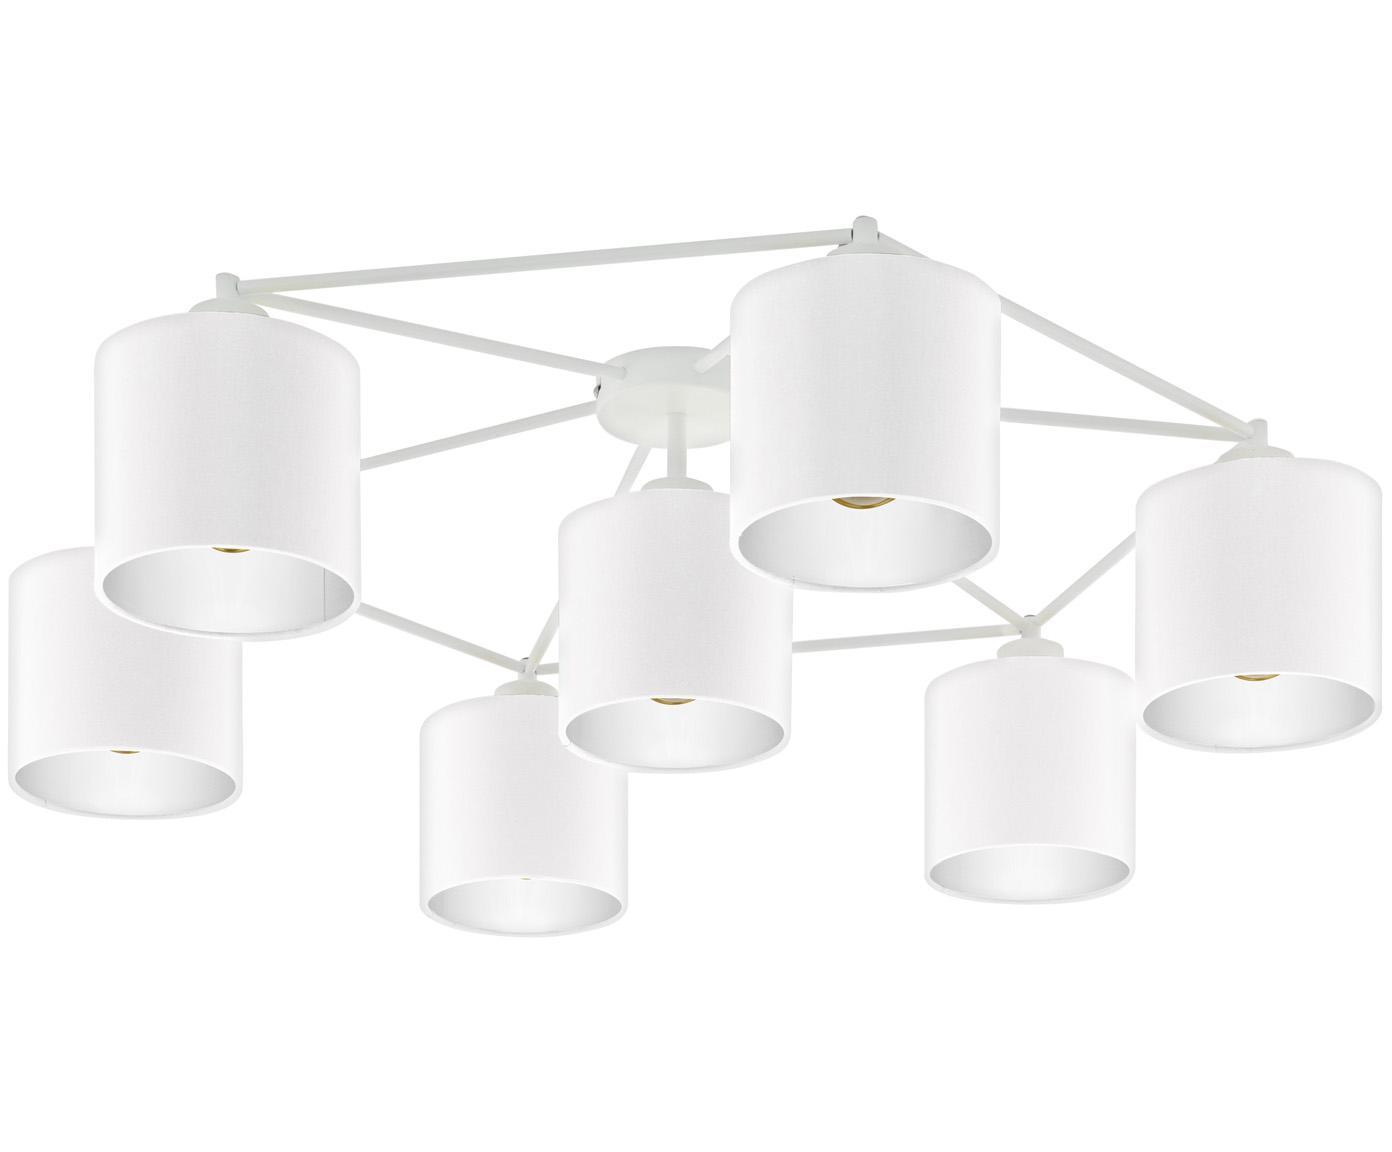 Faretti da soffitto bianchi Staiti, Paralume: poliestere, Bianco, Ø 84 x Alt. 24 cm